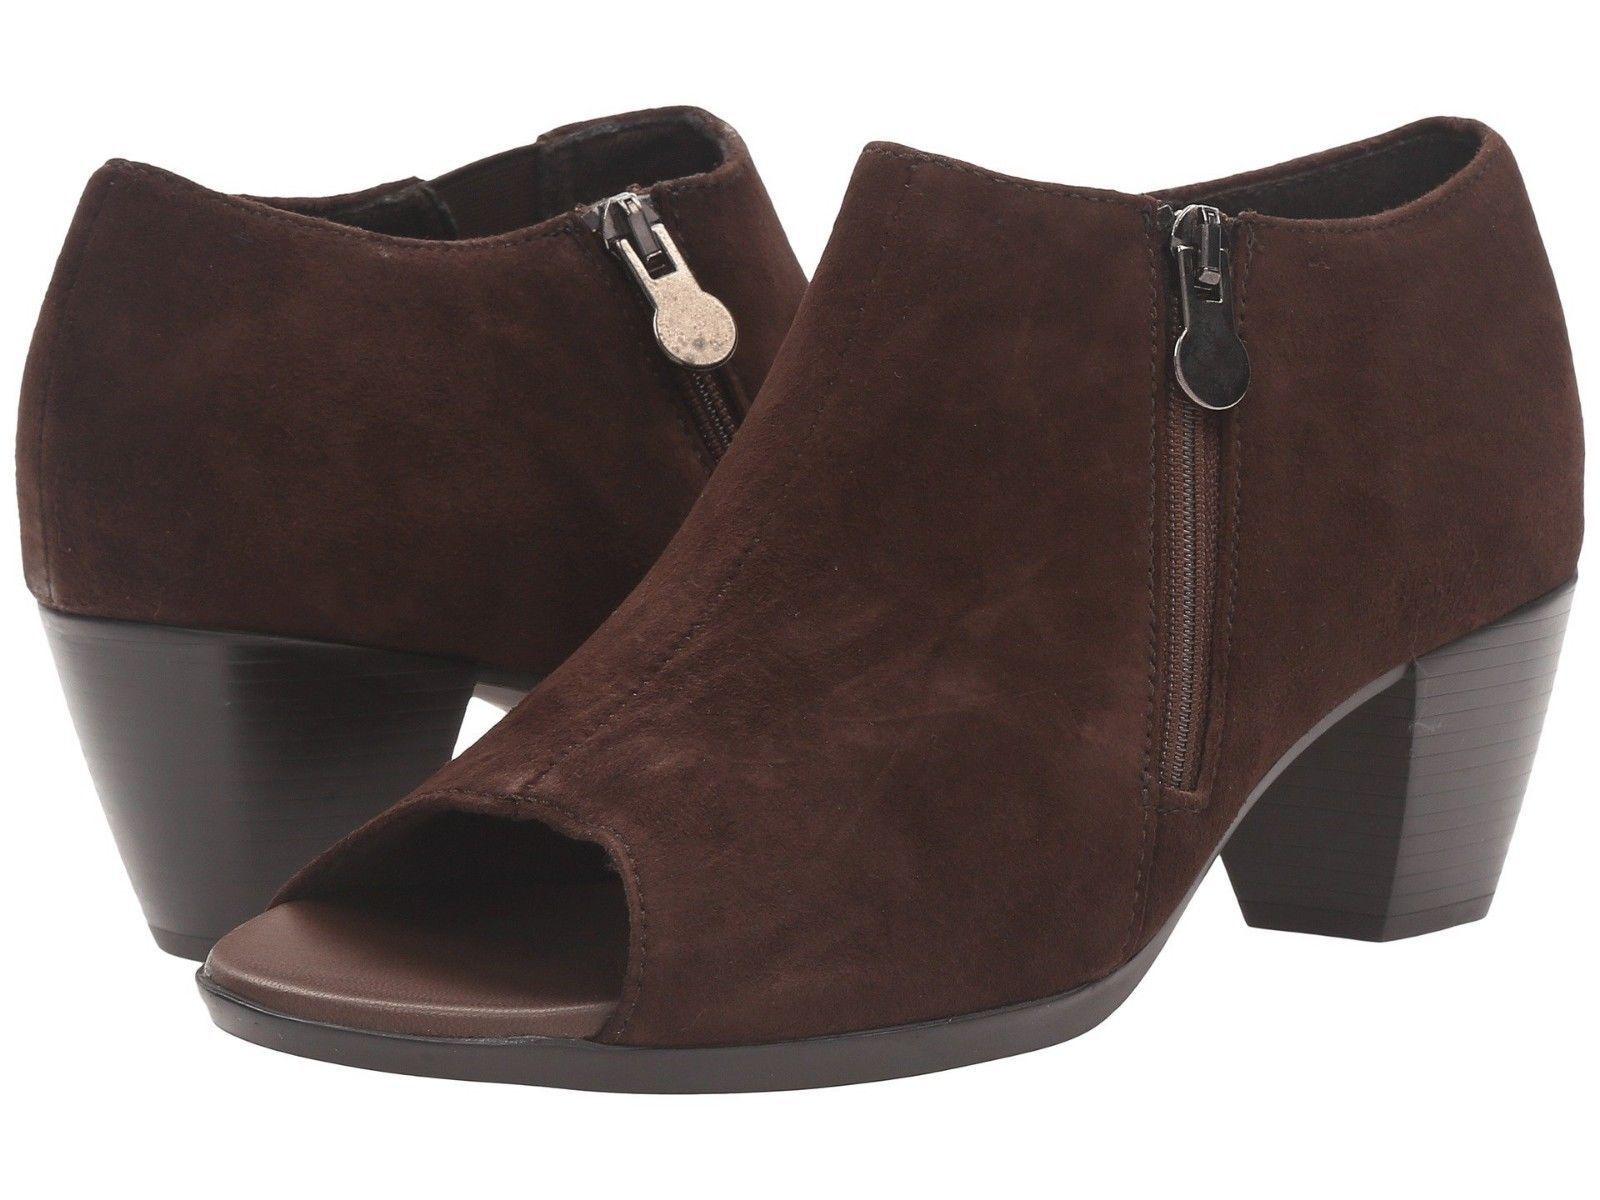 NEW Munro Luisa Bittersweet Brown Suede Peep Toe Boots, Women Size 9.5 W